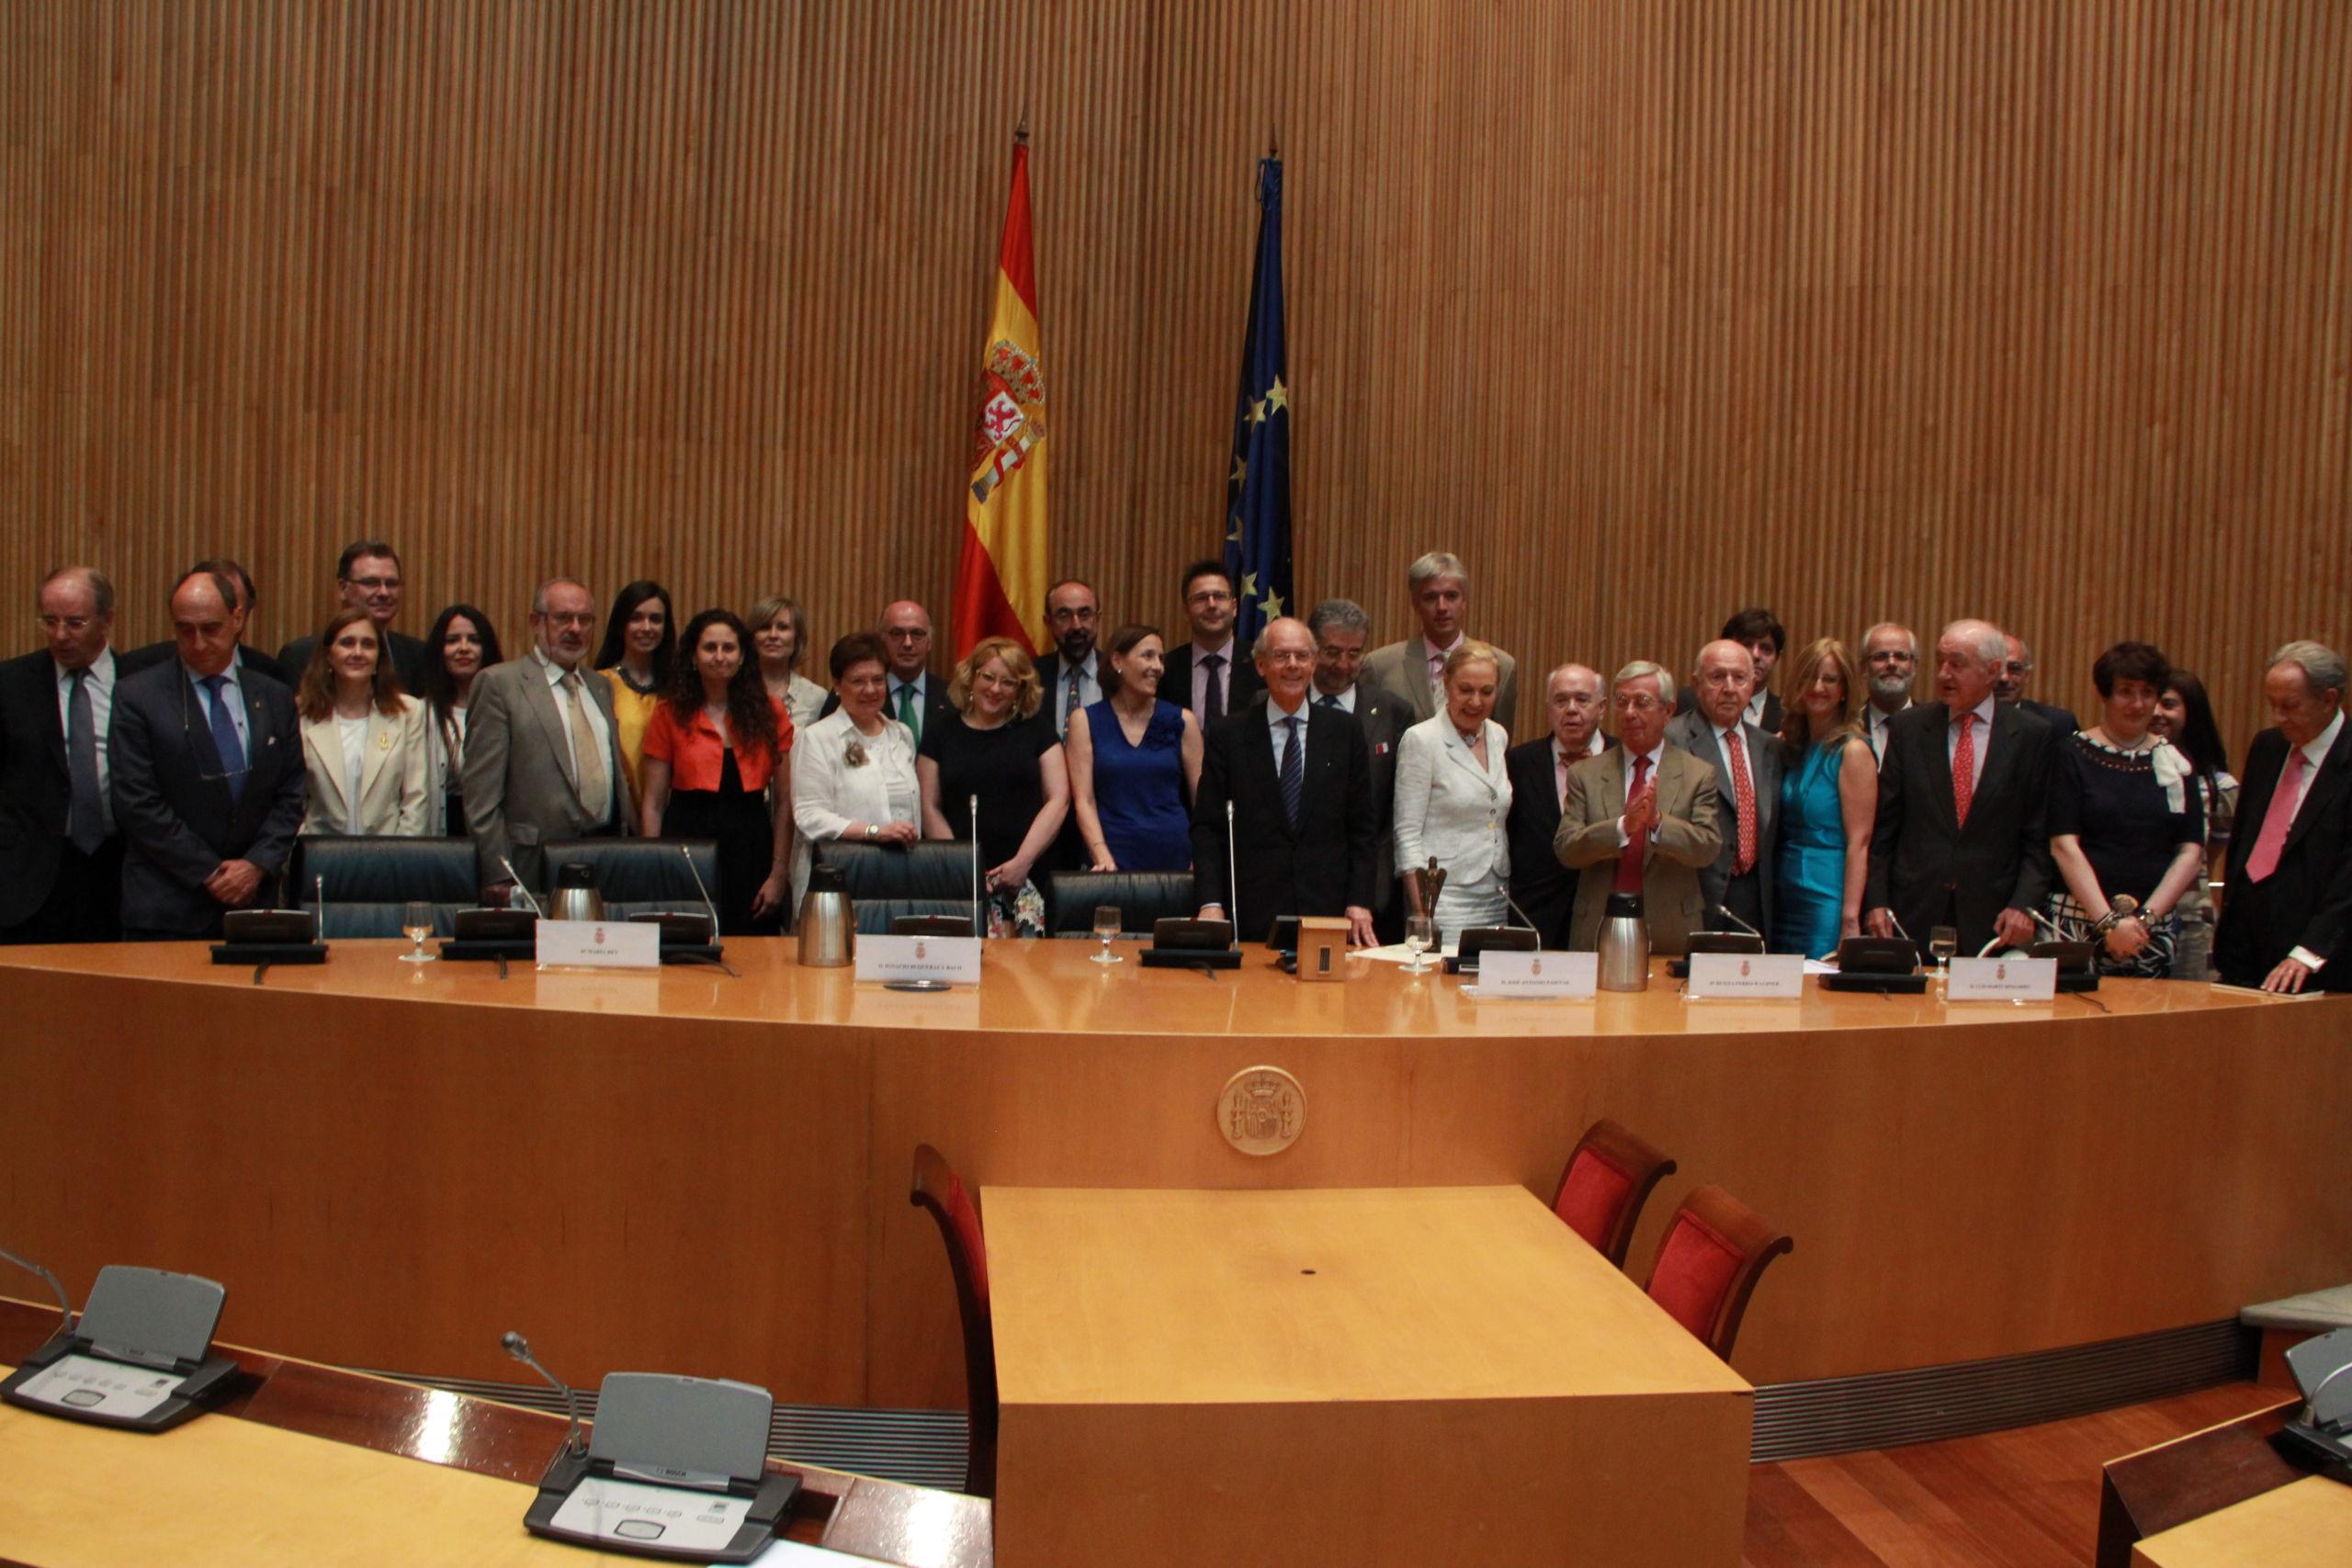 Homenaje universal al idioma español. V aniversario 2